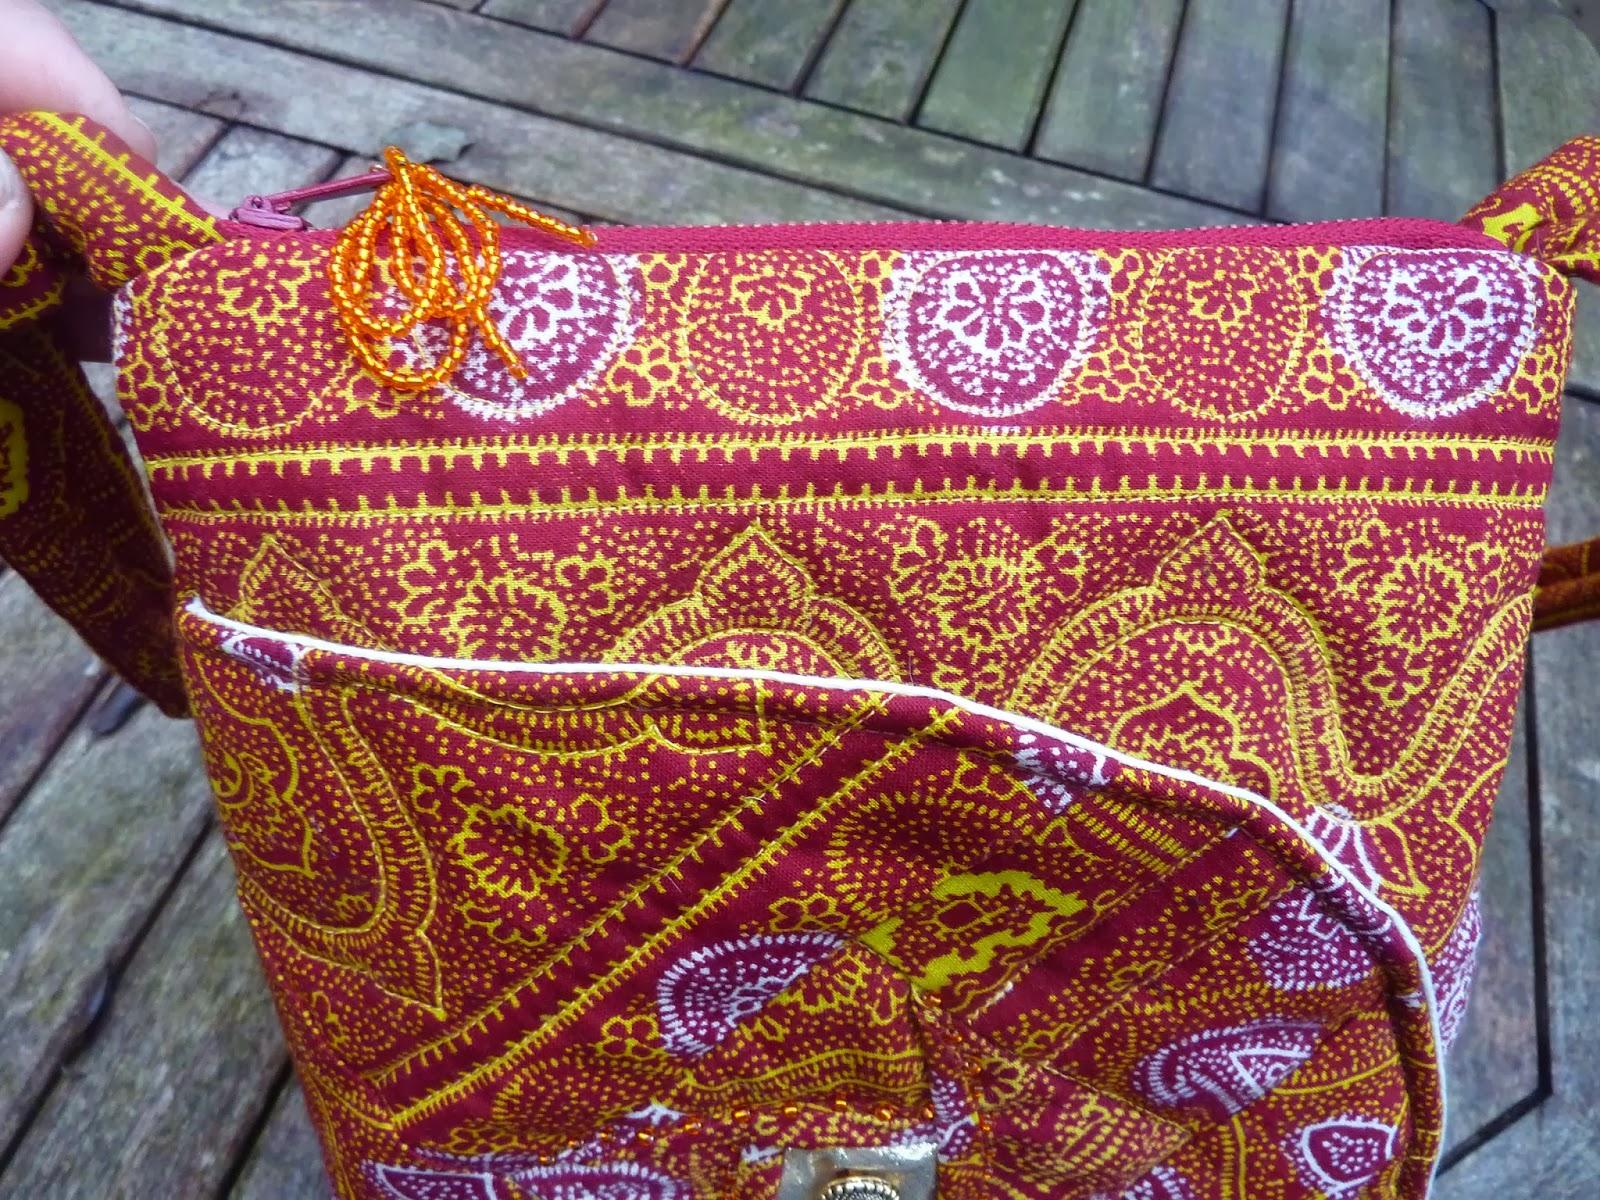 freydaquilts petit sac en tissu africain. Black Bedroom Furniture Sets. Home Design Ideas